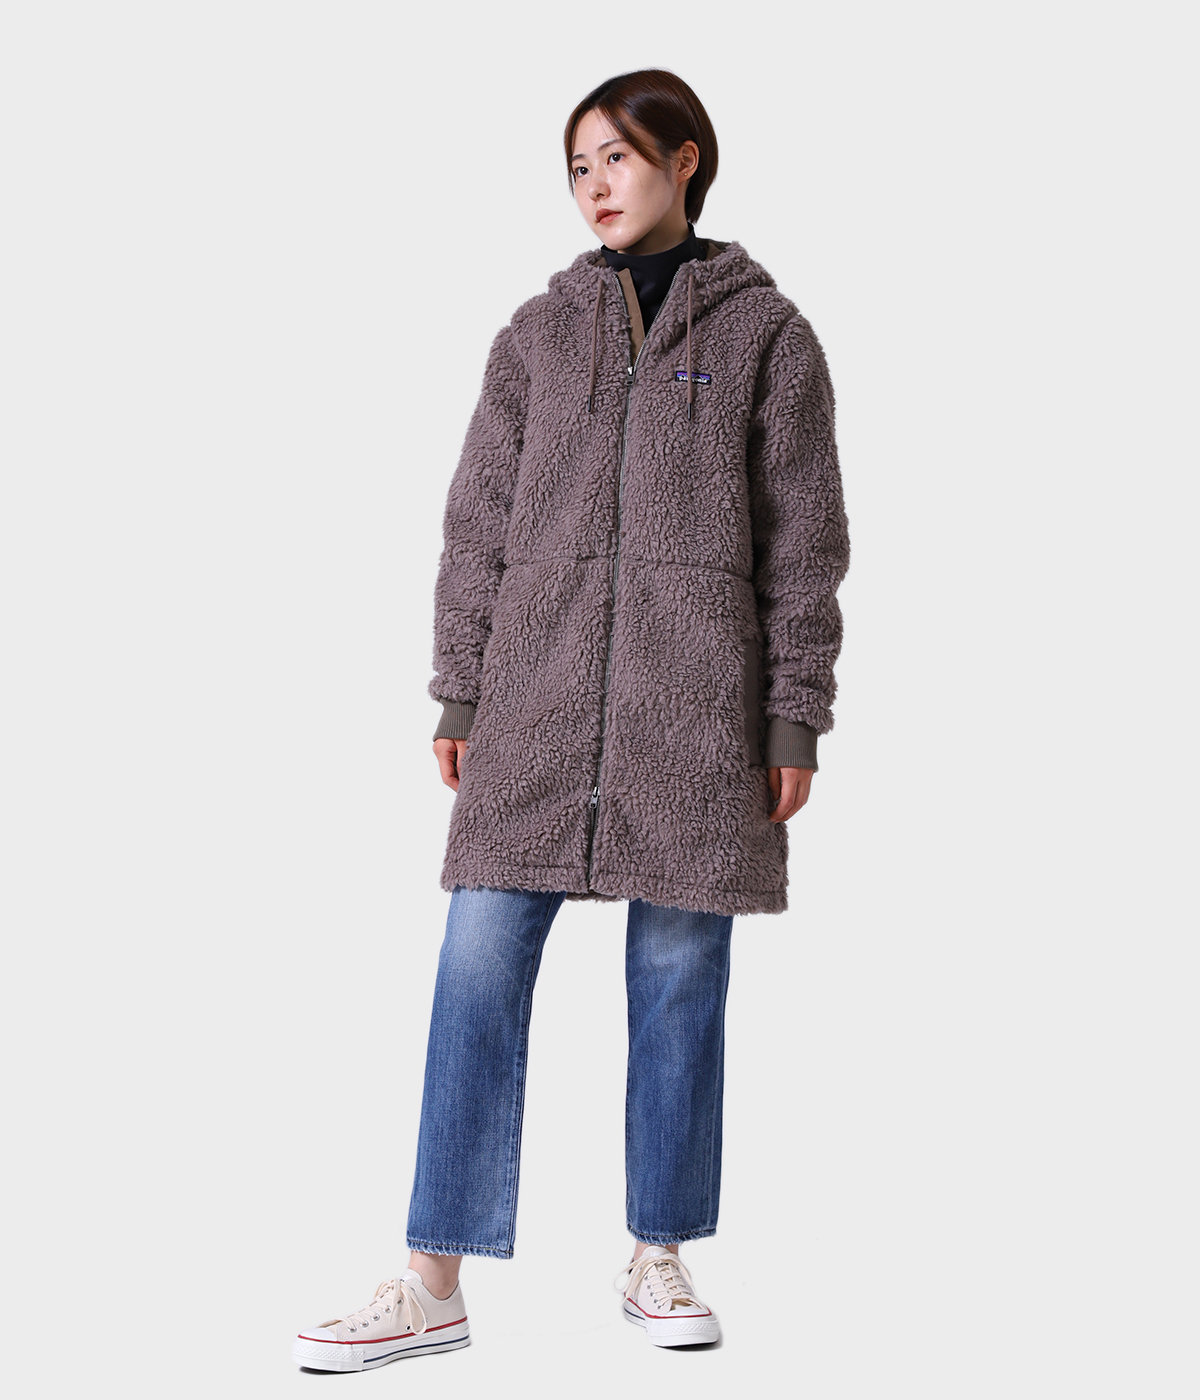 model(169cm) 着用サイズ:L